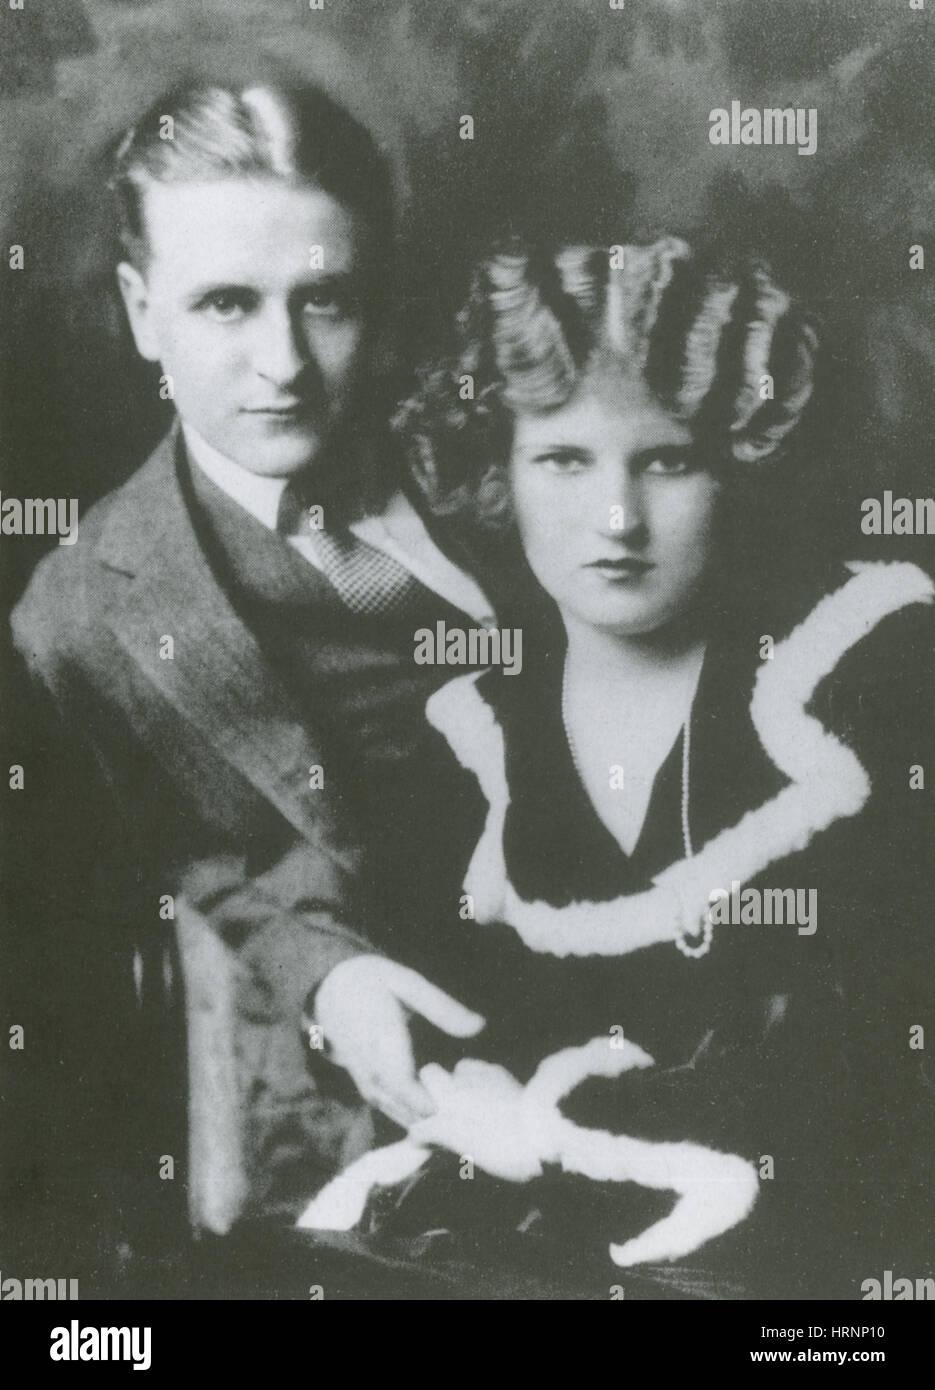 F. Scott and Zelda Fitzgerald, 1923 - Stock Image